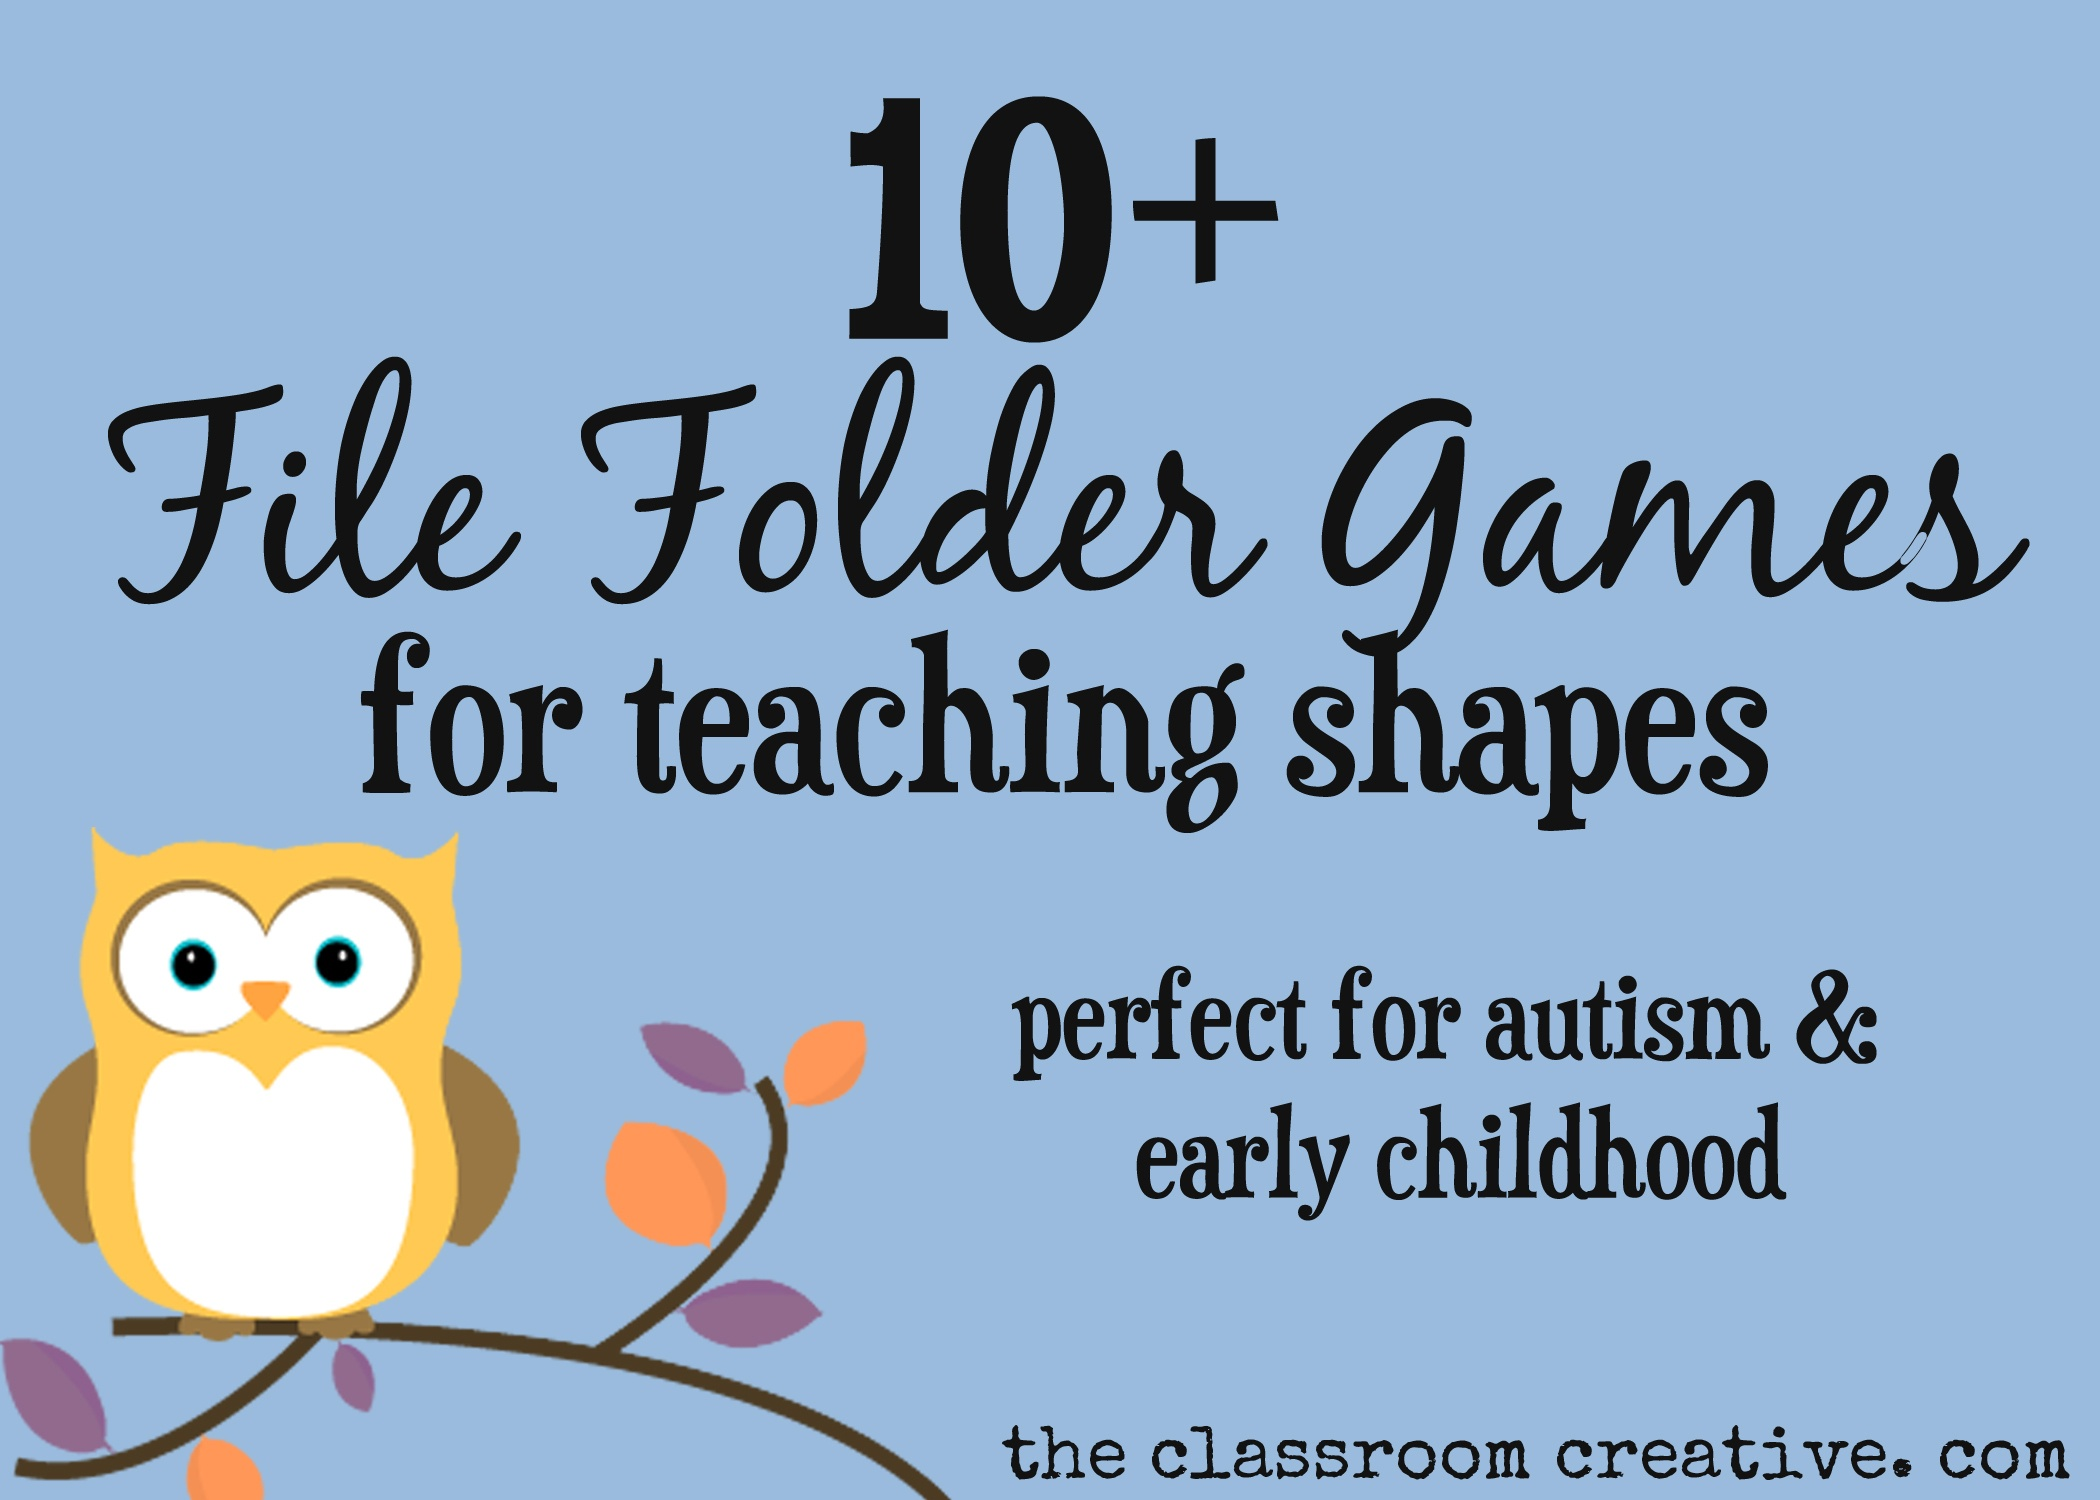 File Folder Games For Teaching Shapes - File Folder Games For Toddlers Free Printable